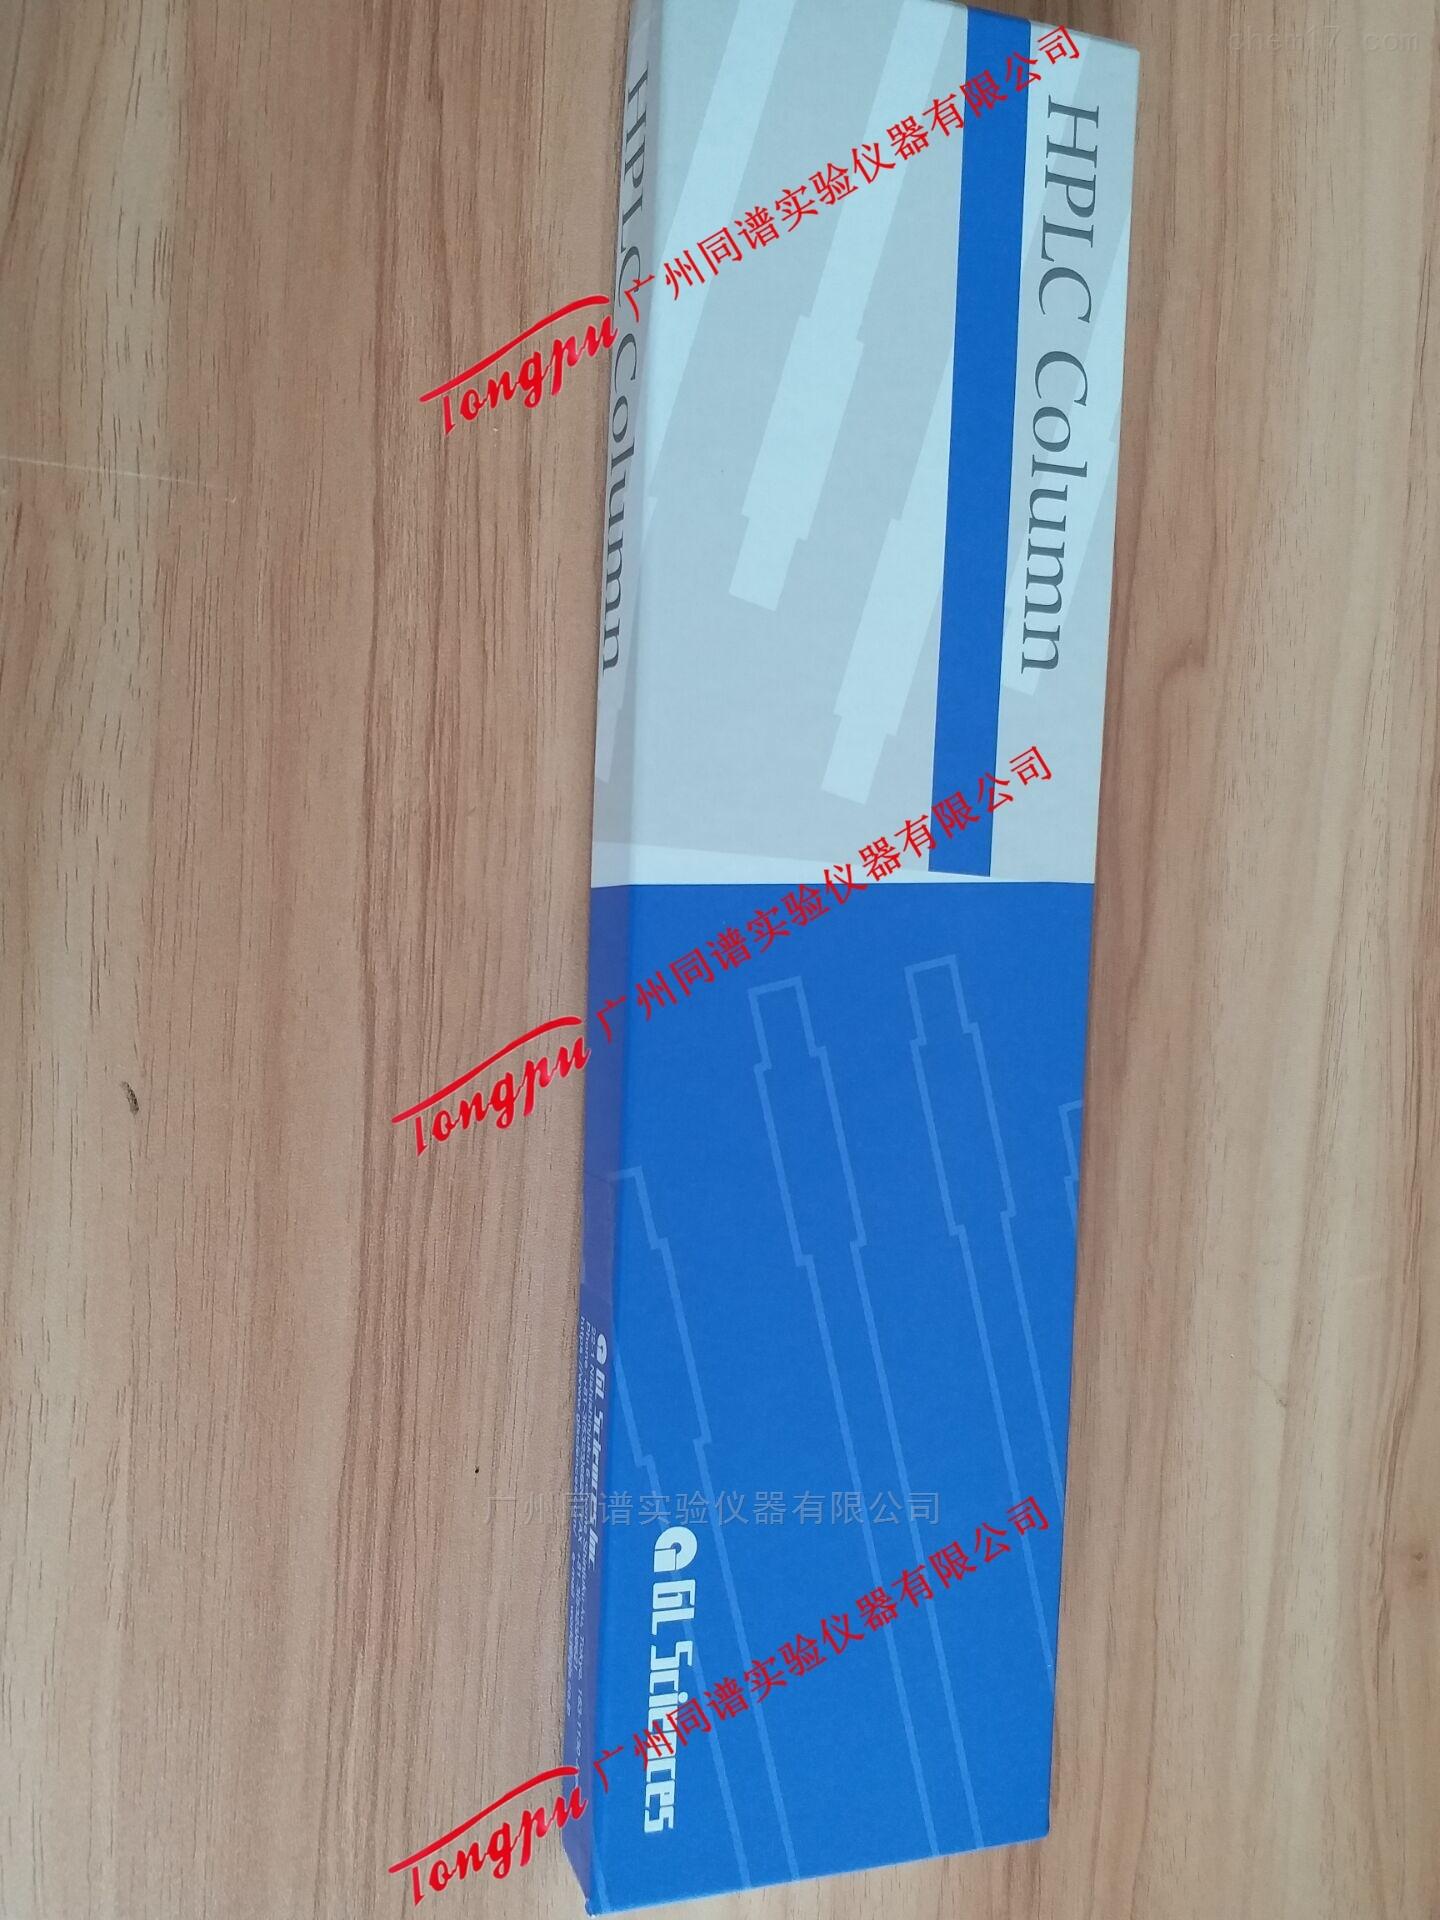 MonoTower C18 岛津整体型硅胶卡套式色谱柱